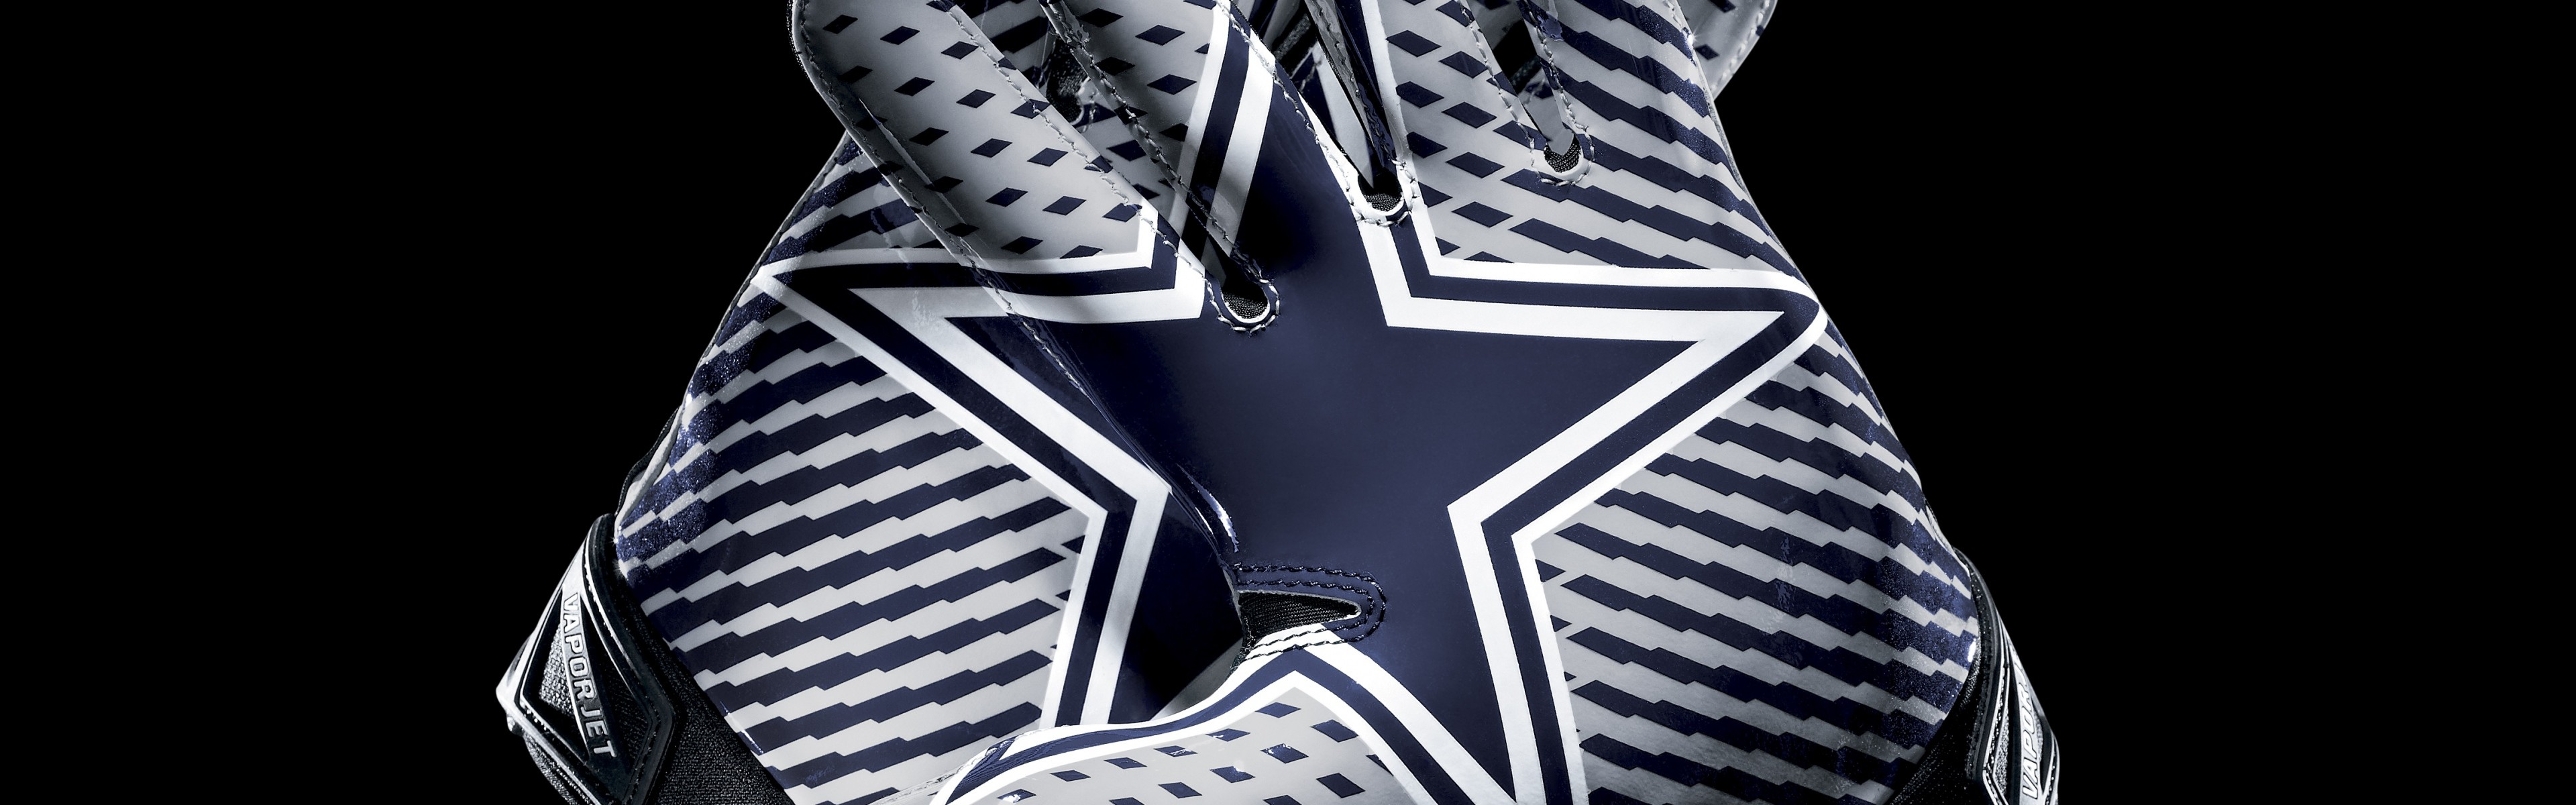 Wallpaper dallas cowboys, football club, texas, arlington